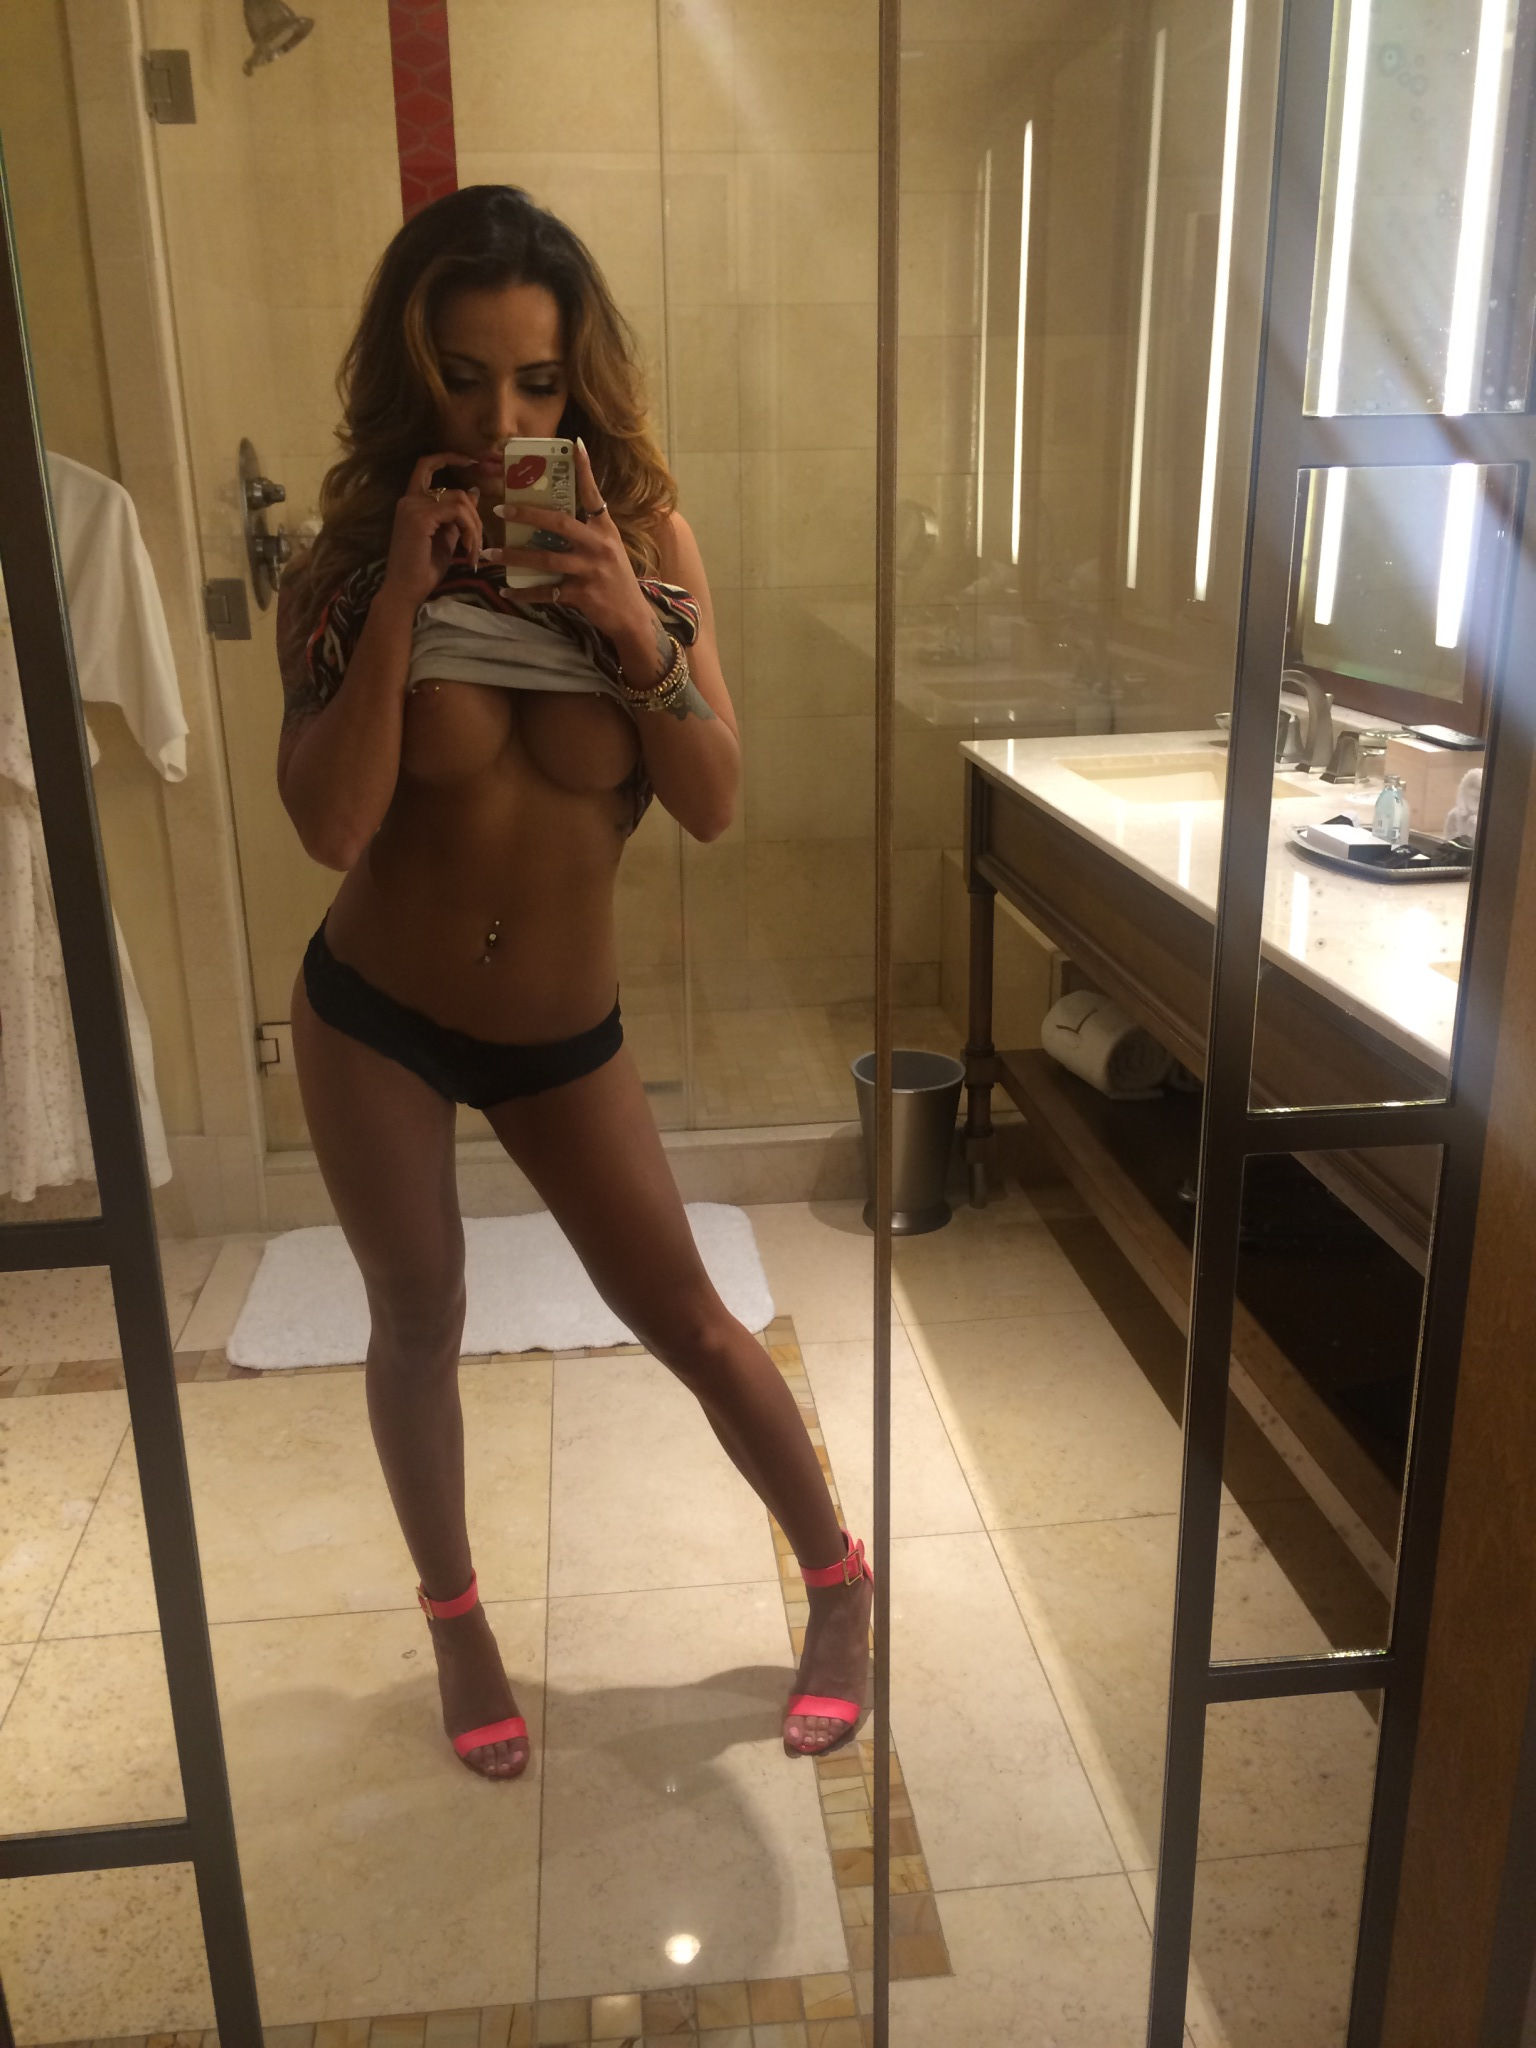 Boobs Mariah Corpus nudes (52 foto and video), Tits, Sideboobs, Boobs, braless 2017